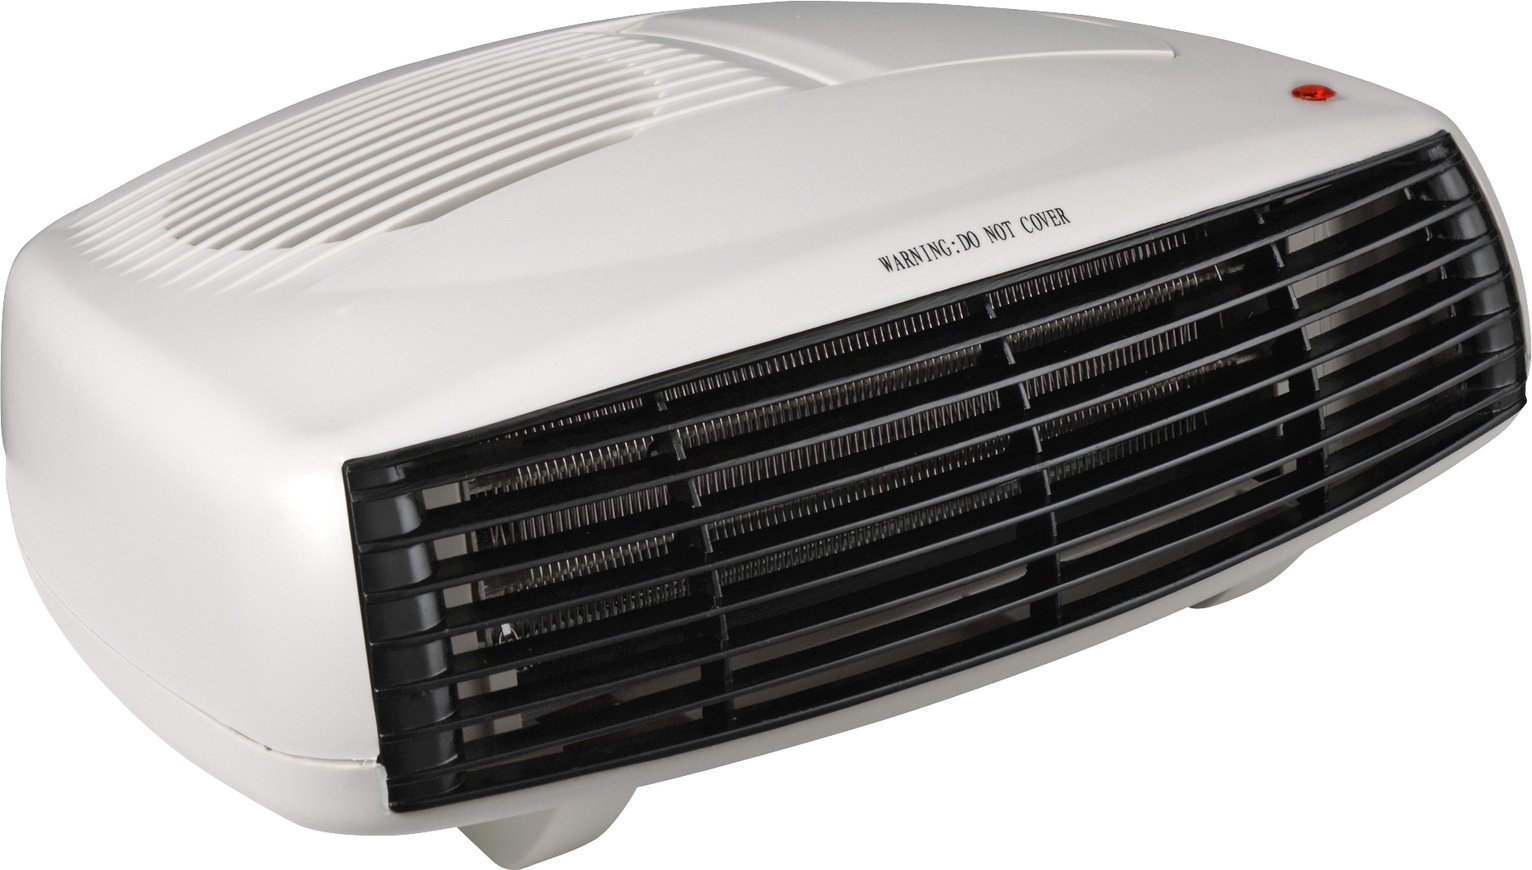 challenge 3kw flat fan heater 4152590 argos price. Black Bedroom Furniture Sets. Home Design Ideas